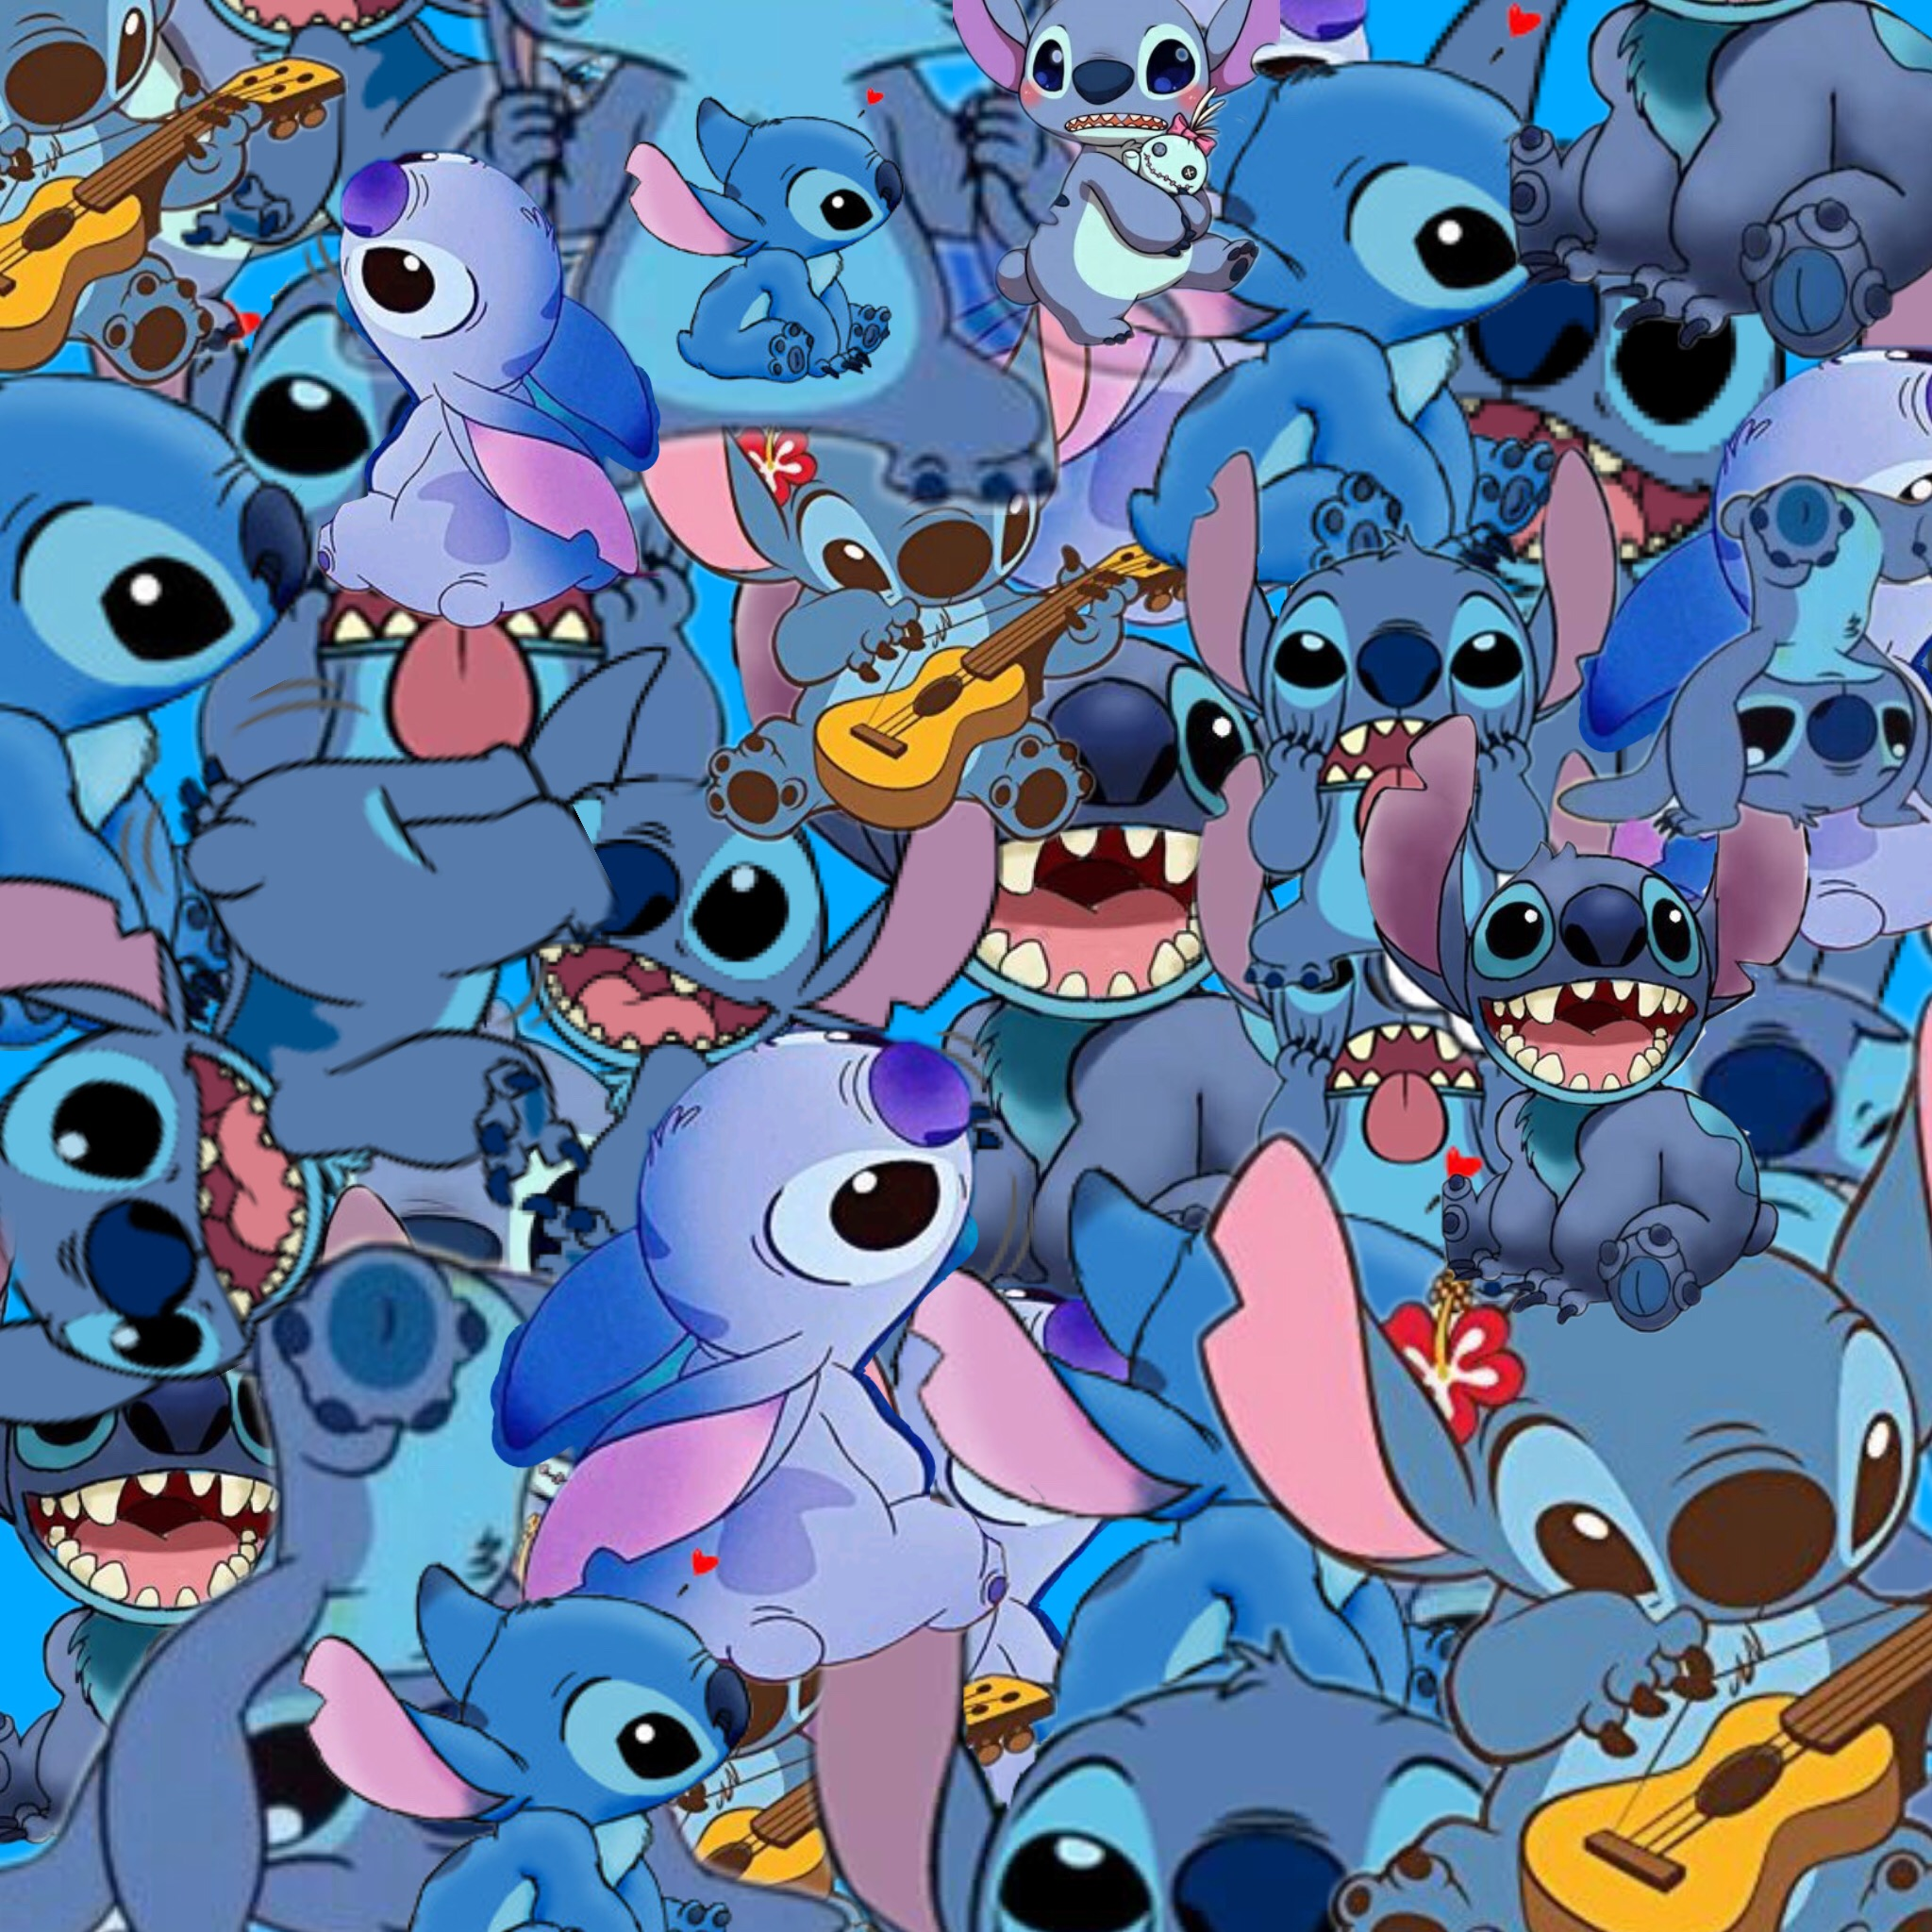 Cute Cartoon Angel Wallpaper Freetoedit Wallpaper Stitch Blue Art Interesting Cartoo